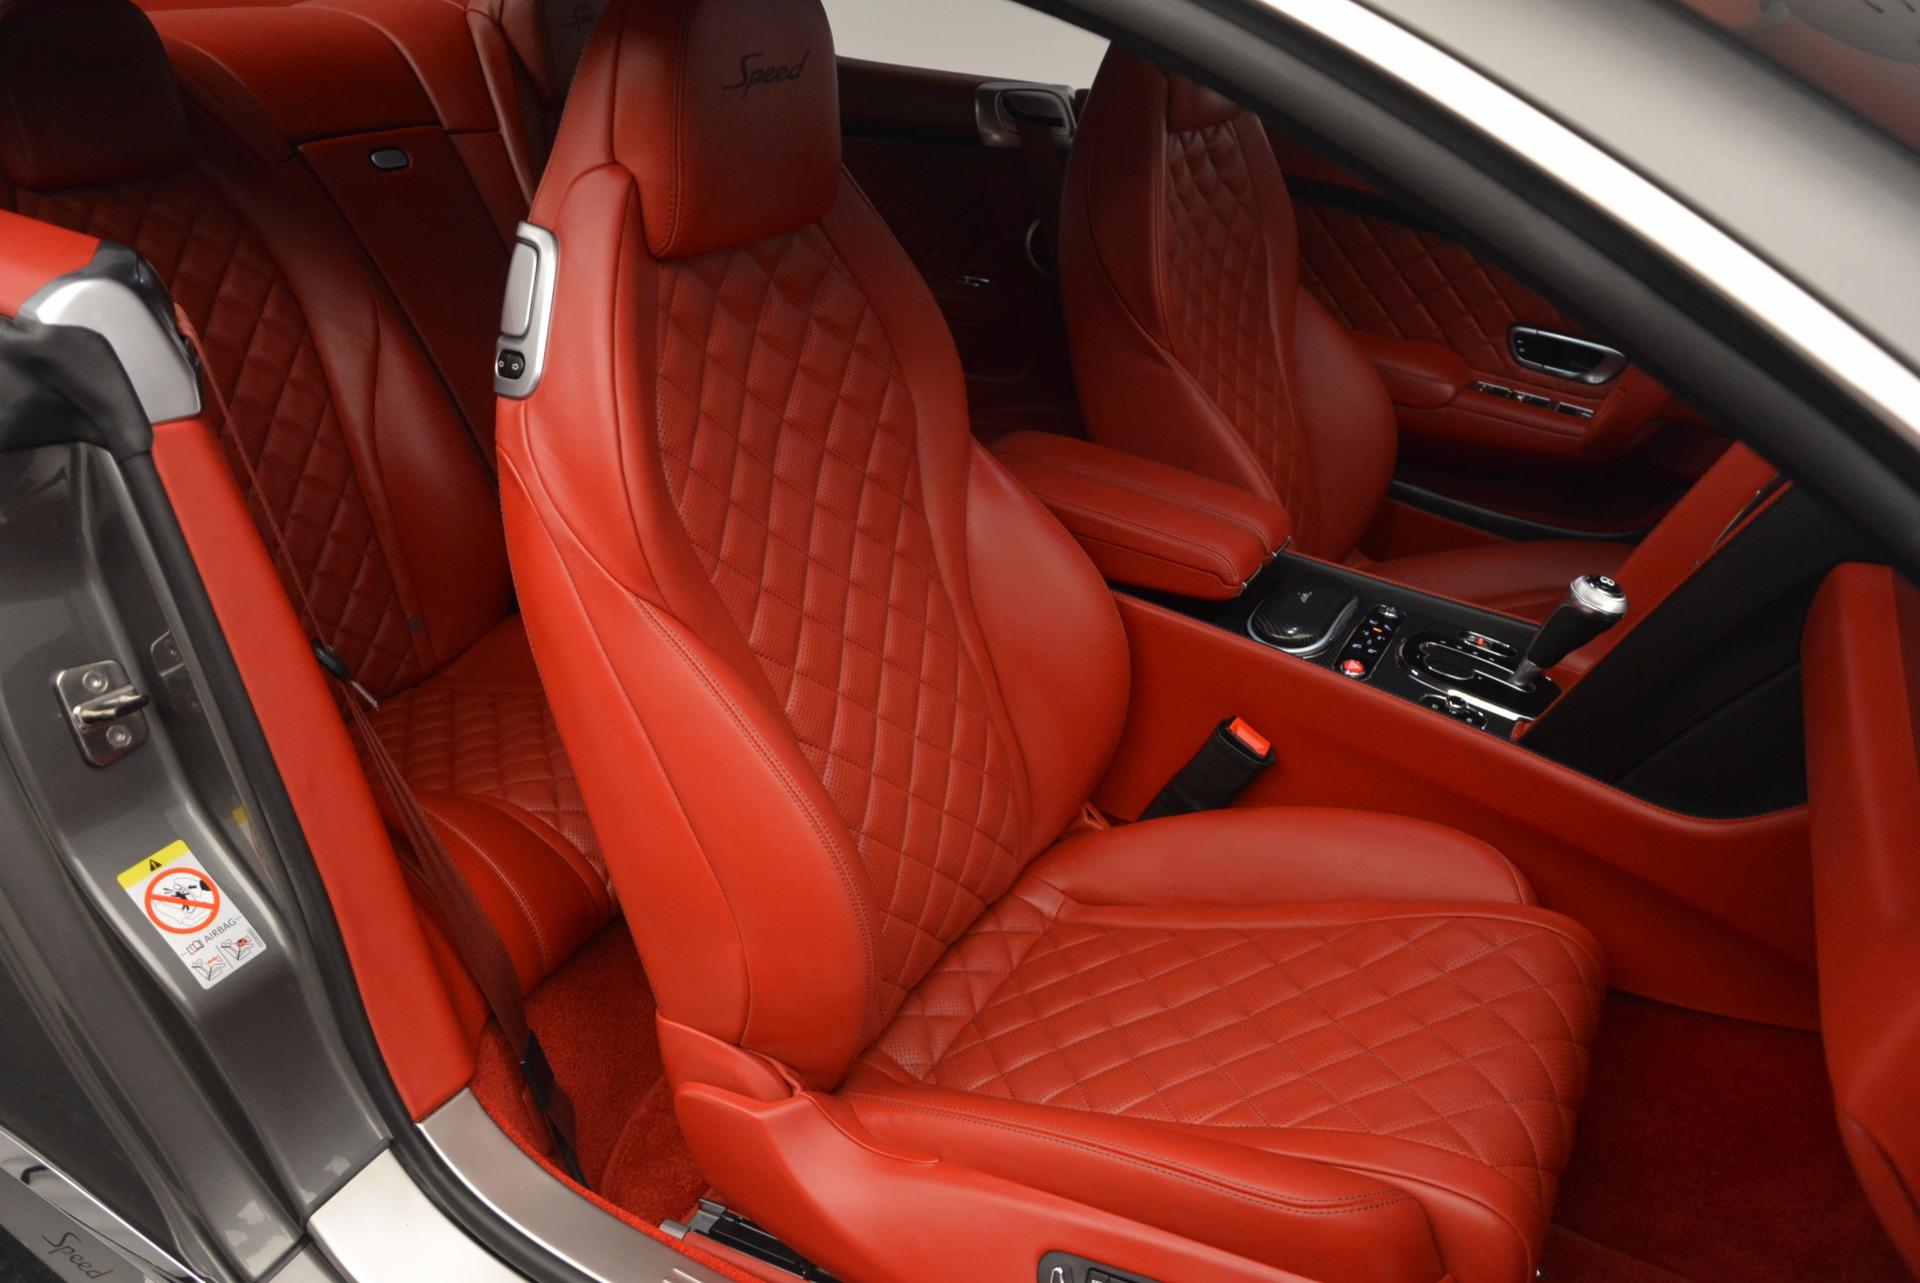 Used 2016 Bentley Continental GT Speed For Sale In Westport, CT 910_p37